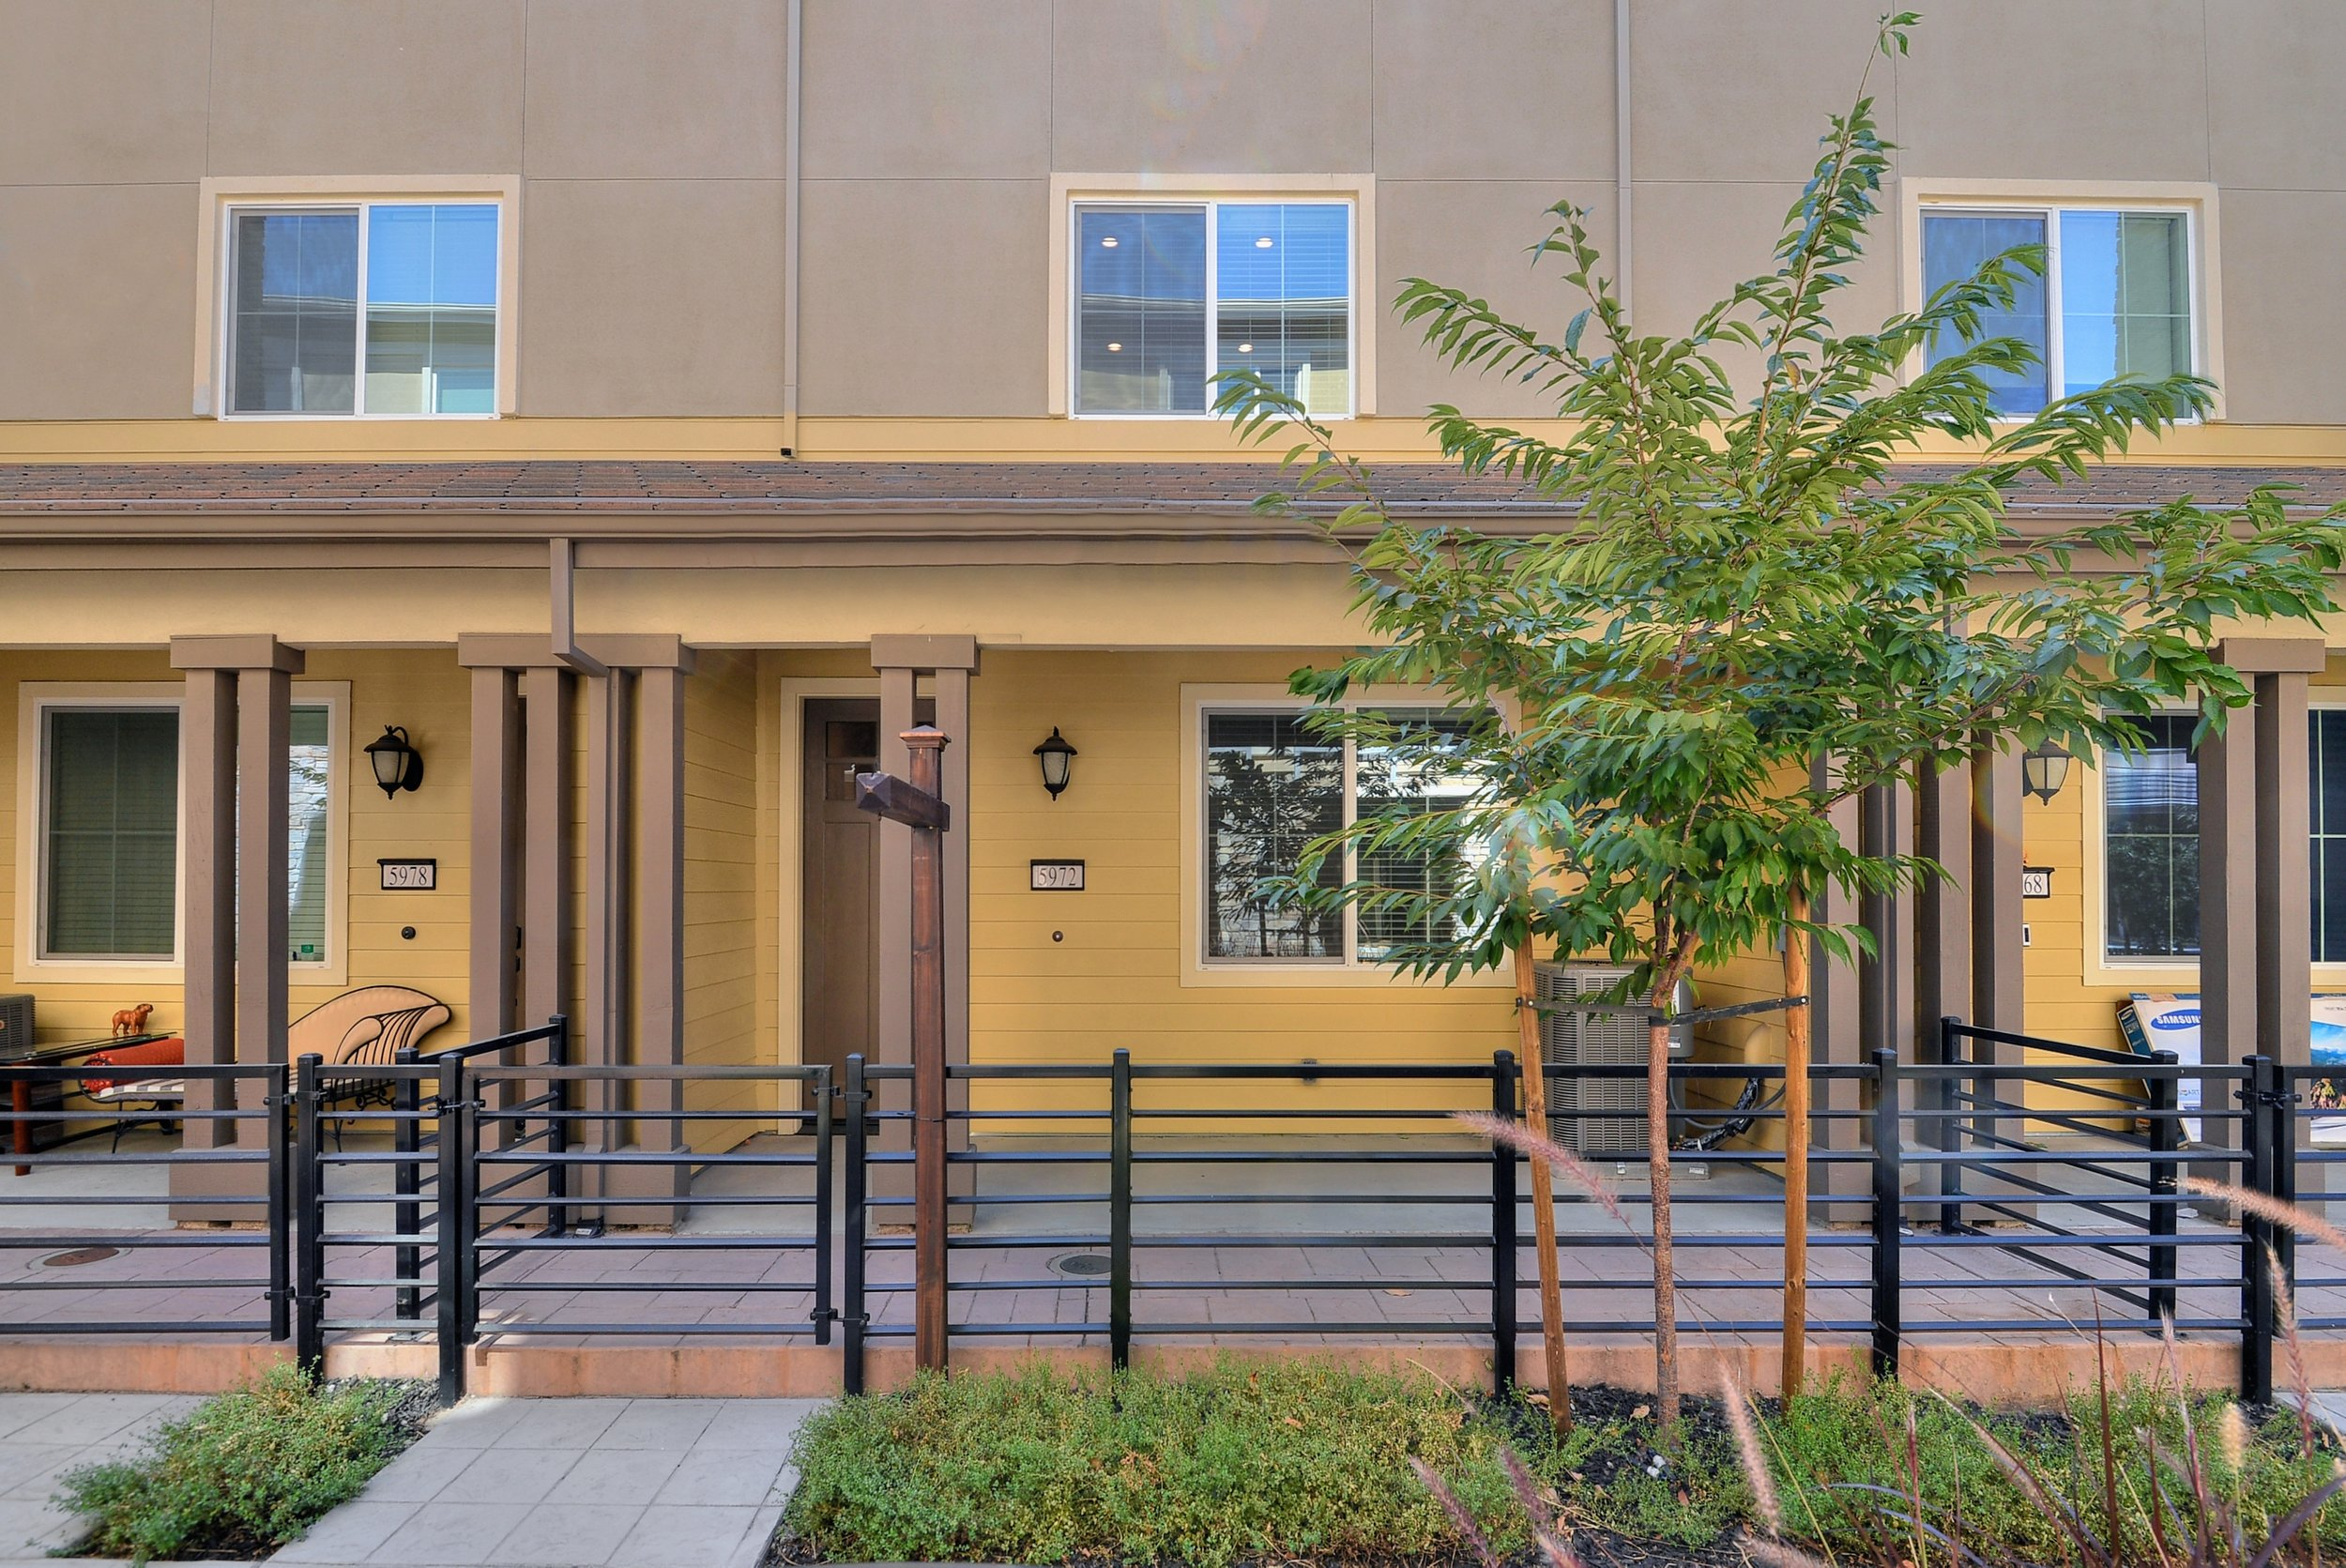 5972 Reddick Loop, San Jose  3 bedrooms • 3.5 bathrooms • 1,901 sq ft interior